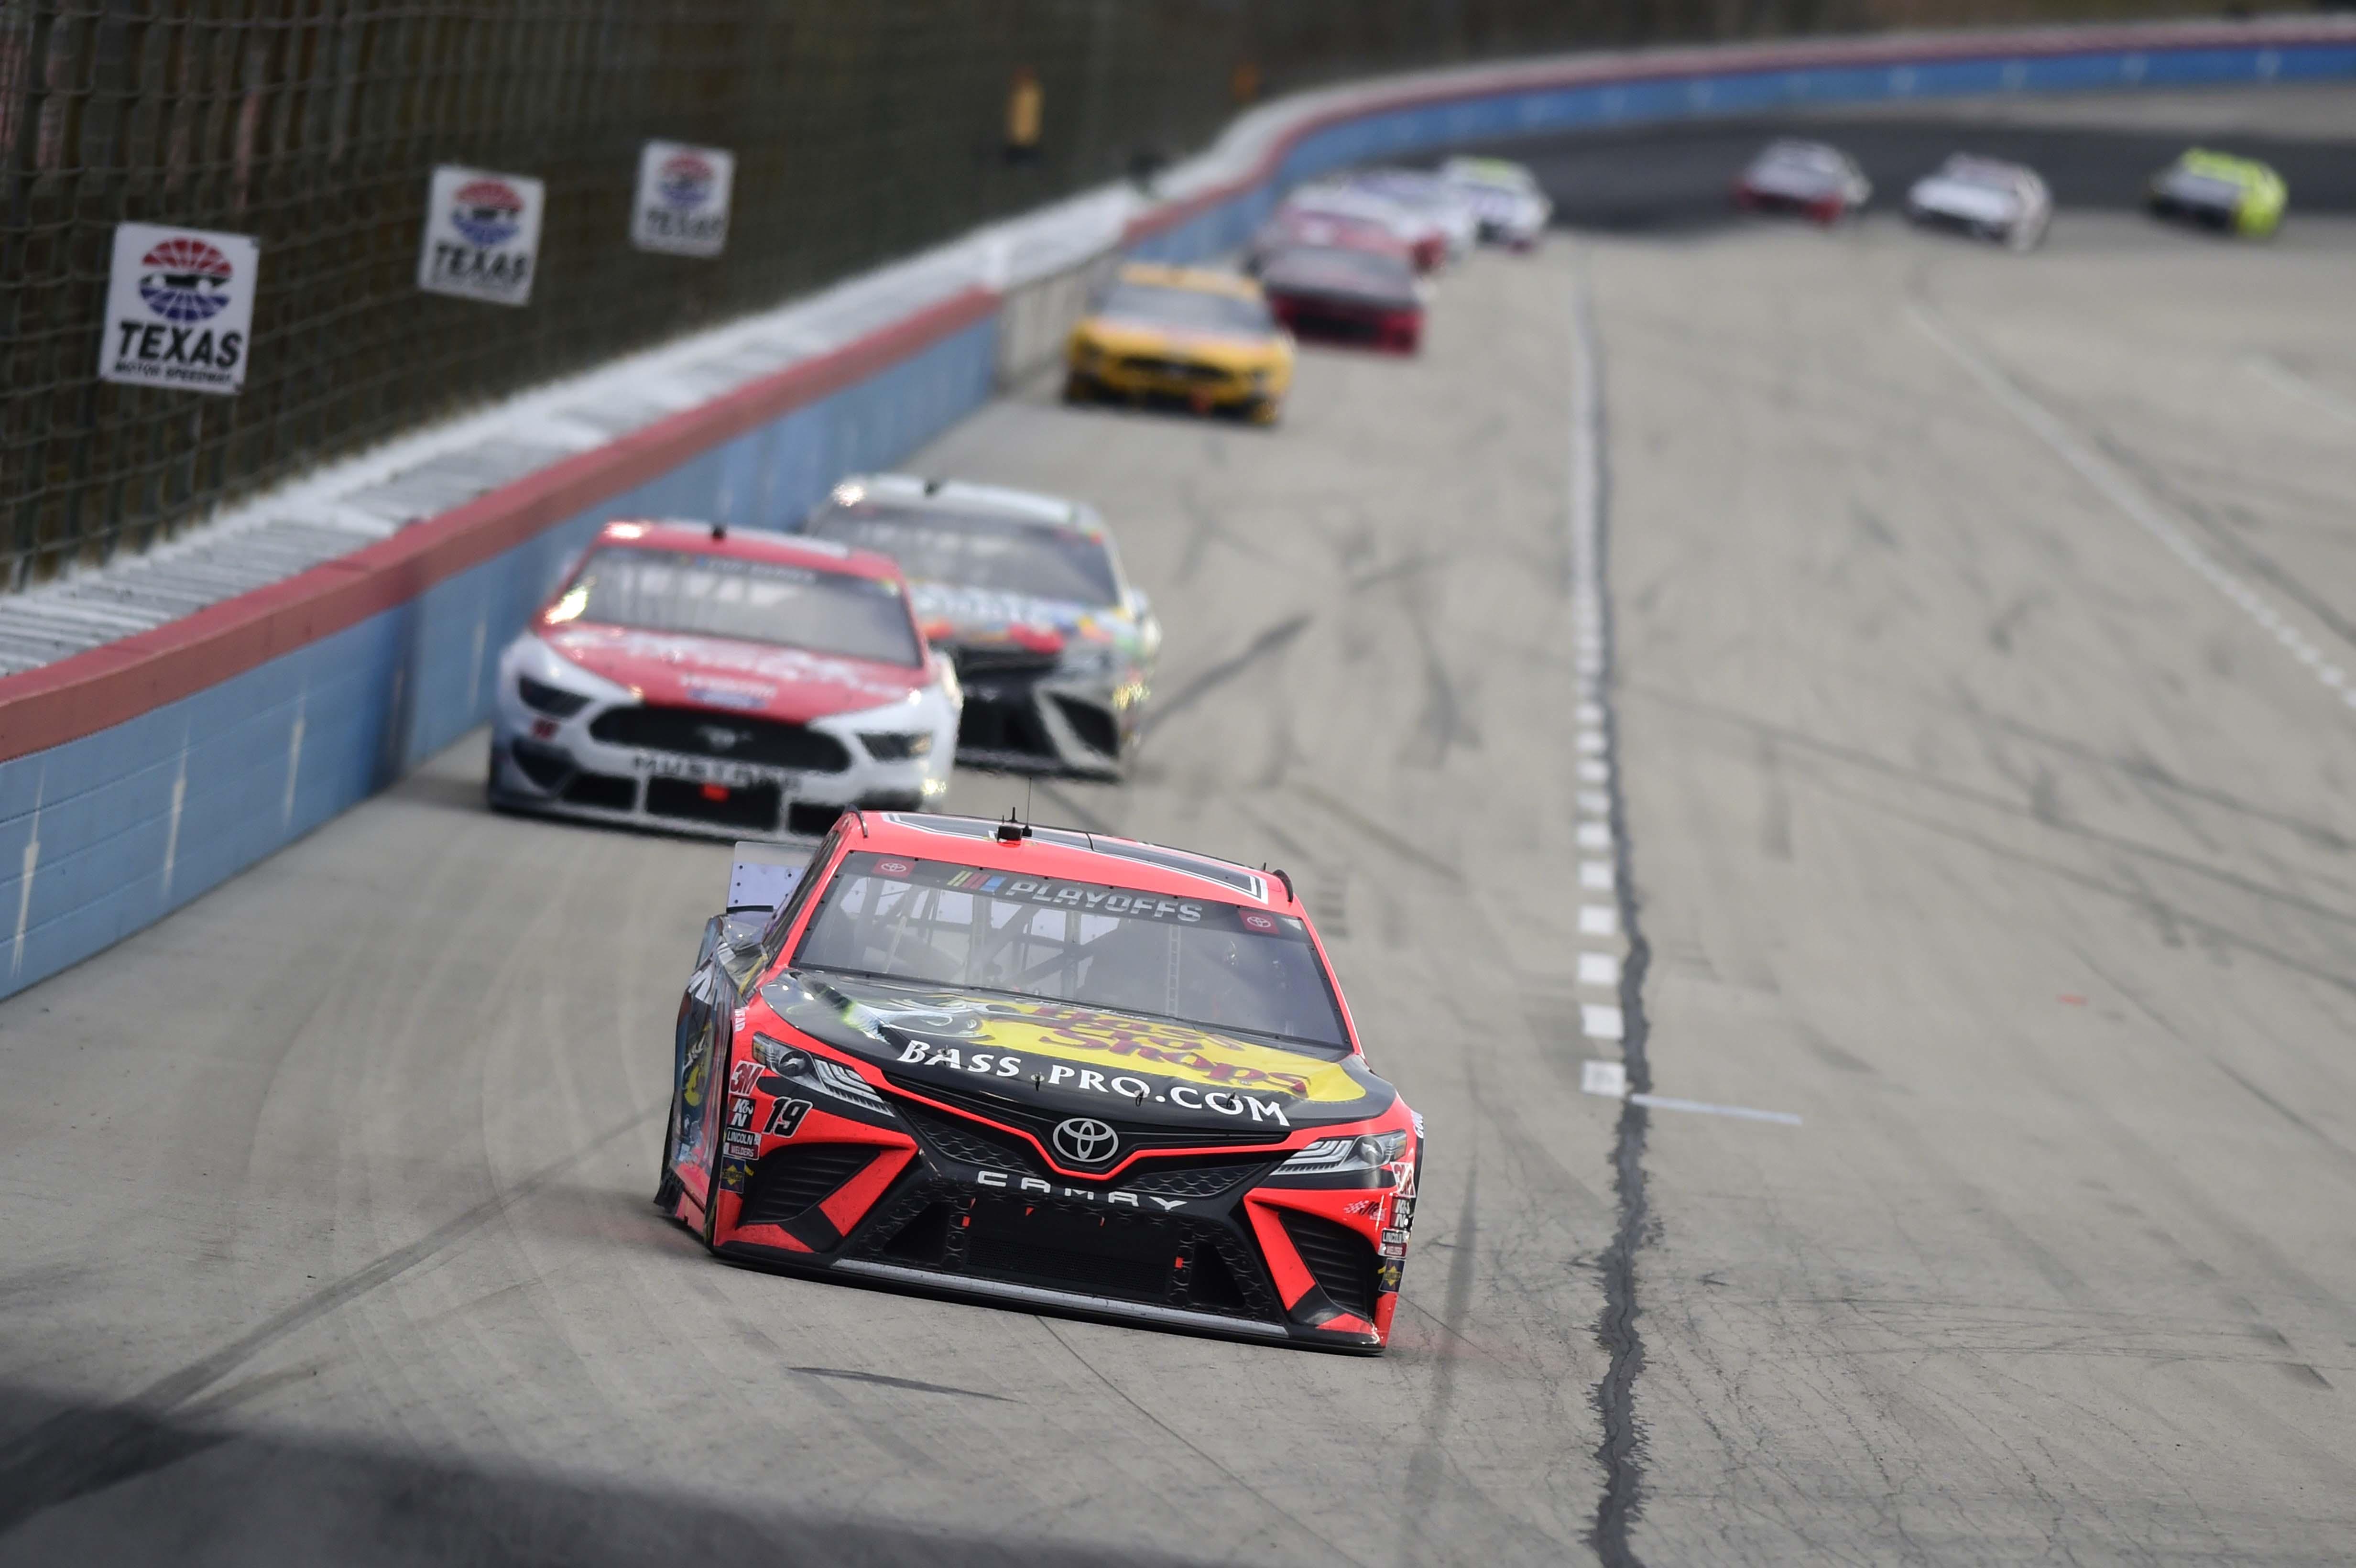 Martin Truex Jr at Texas Motor Speedway - NASCAR Cup Series